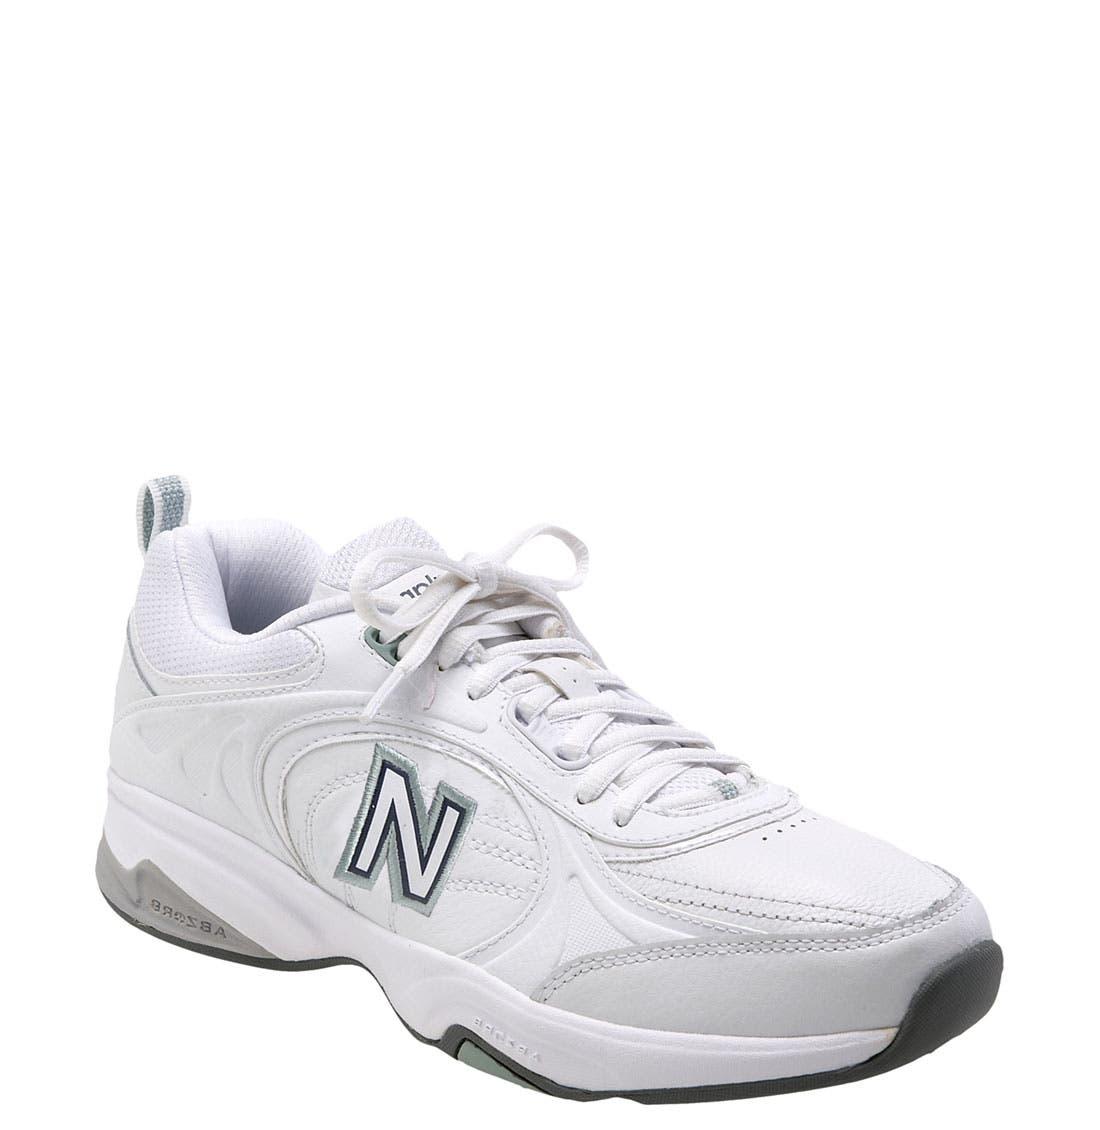 Main Image - New Balance '623' Training Shoe (Women)